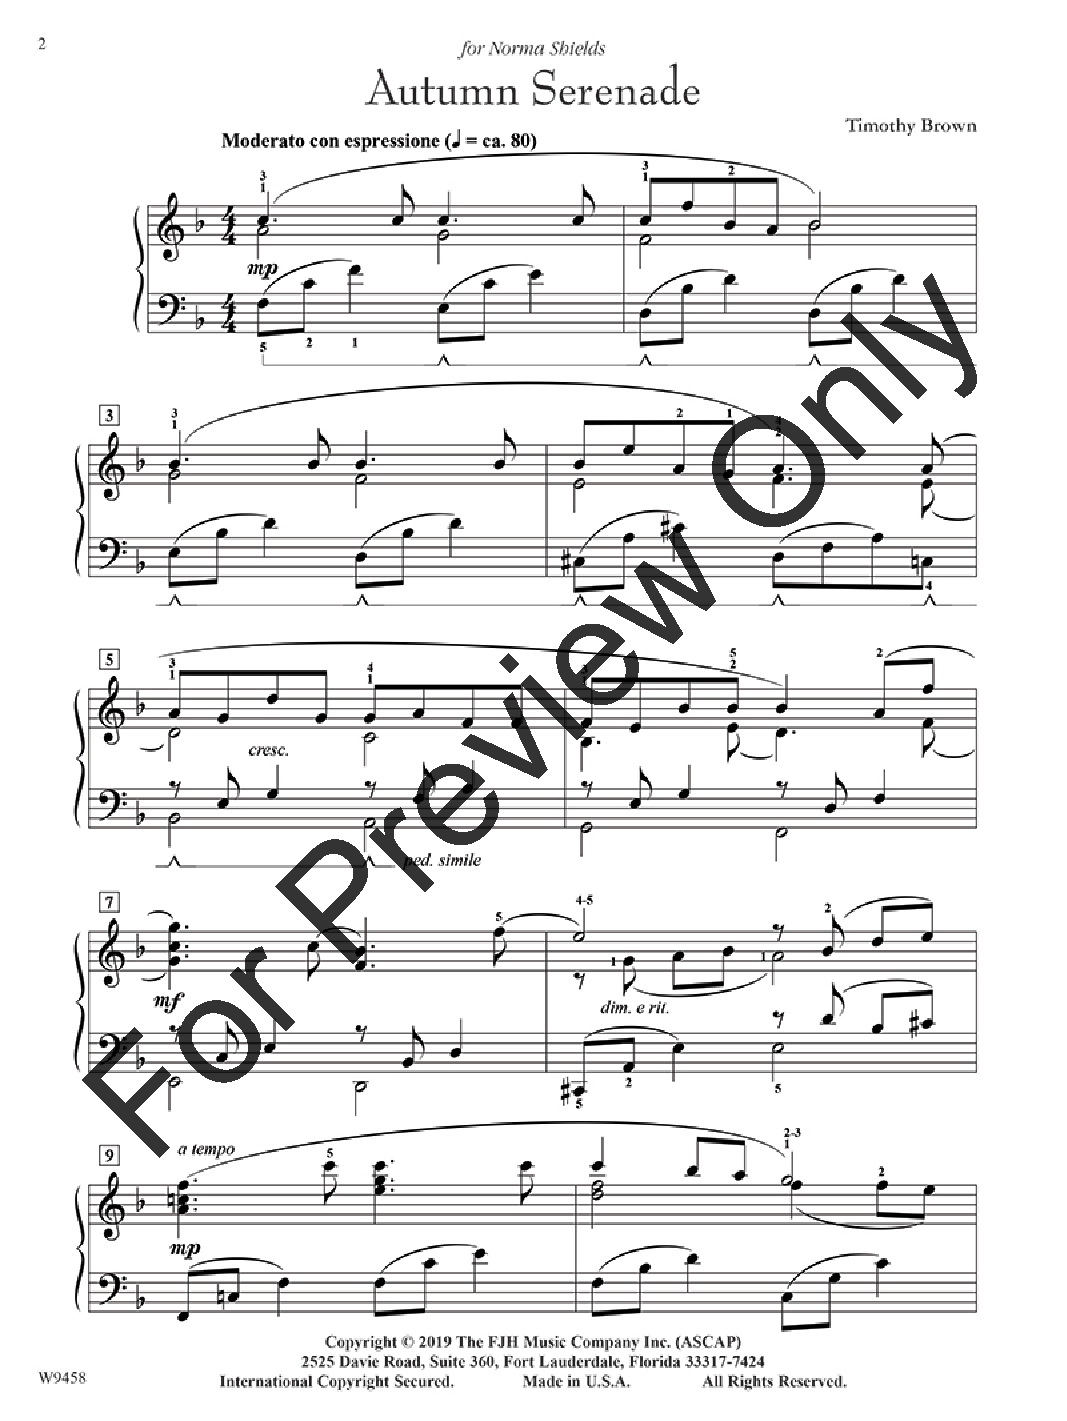 Autumn Serenade by Timothy Brown| J.W. Pepper Sheet Music